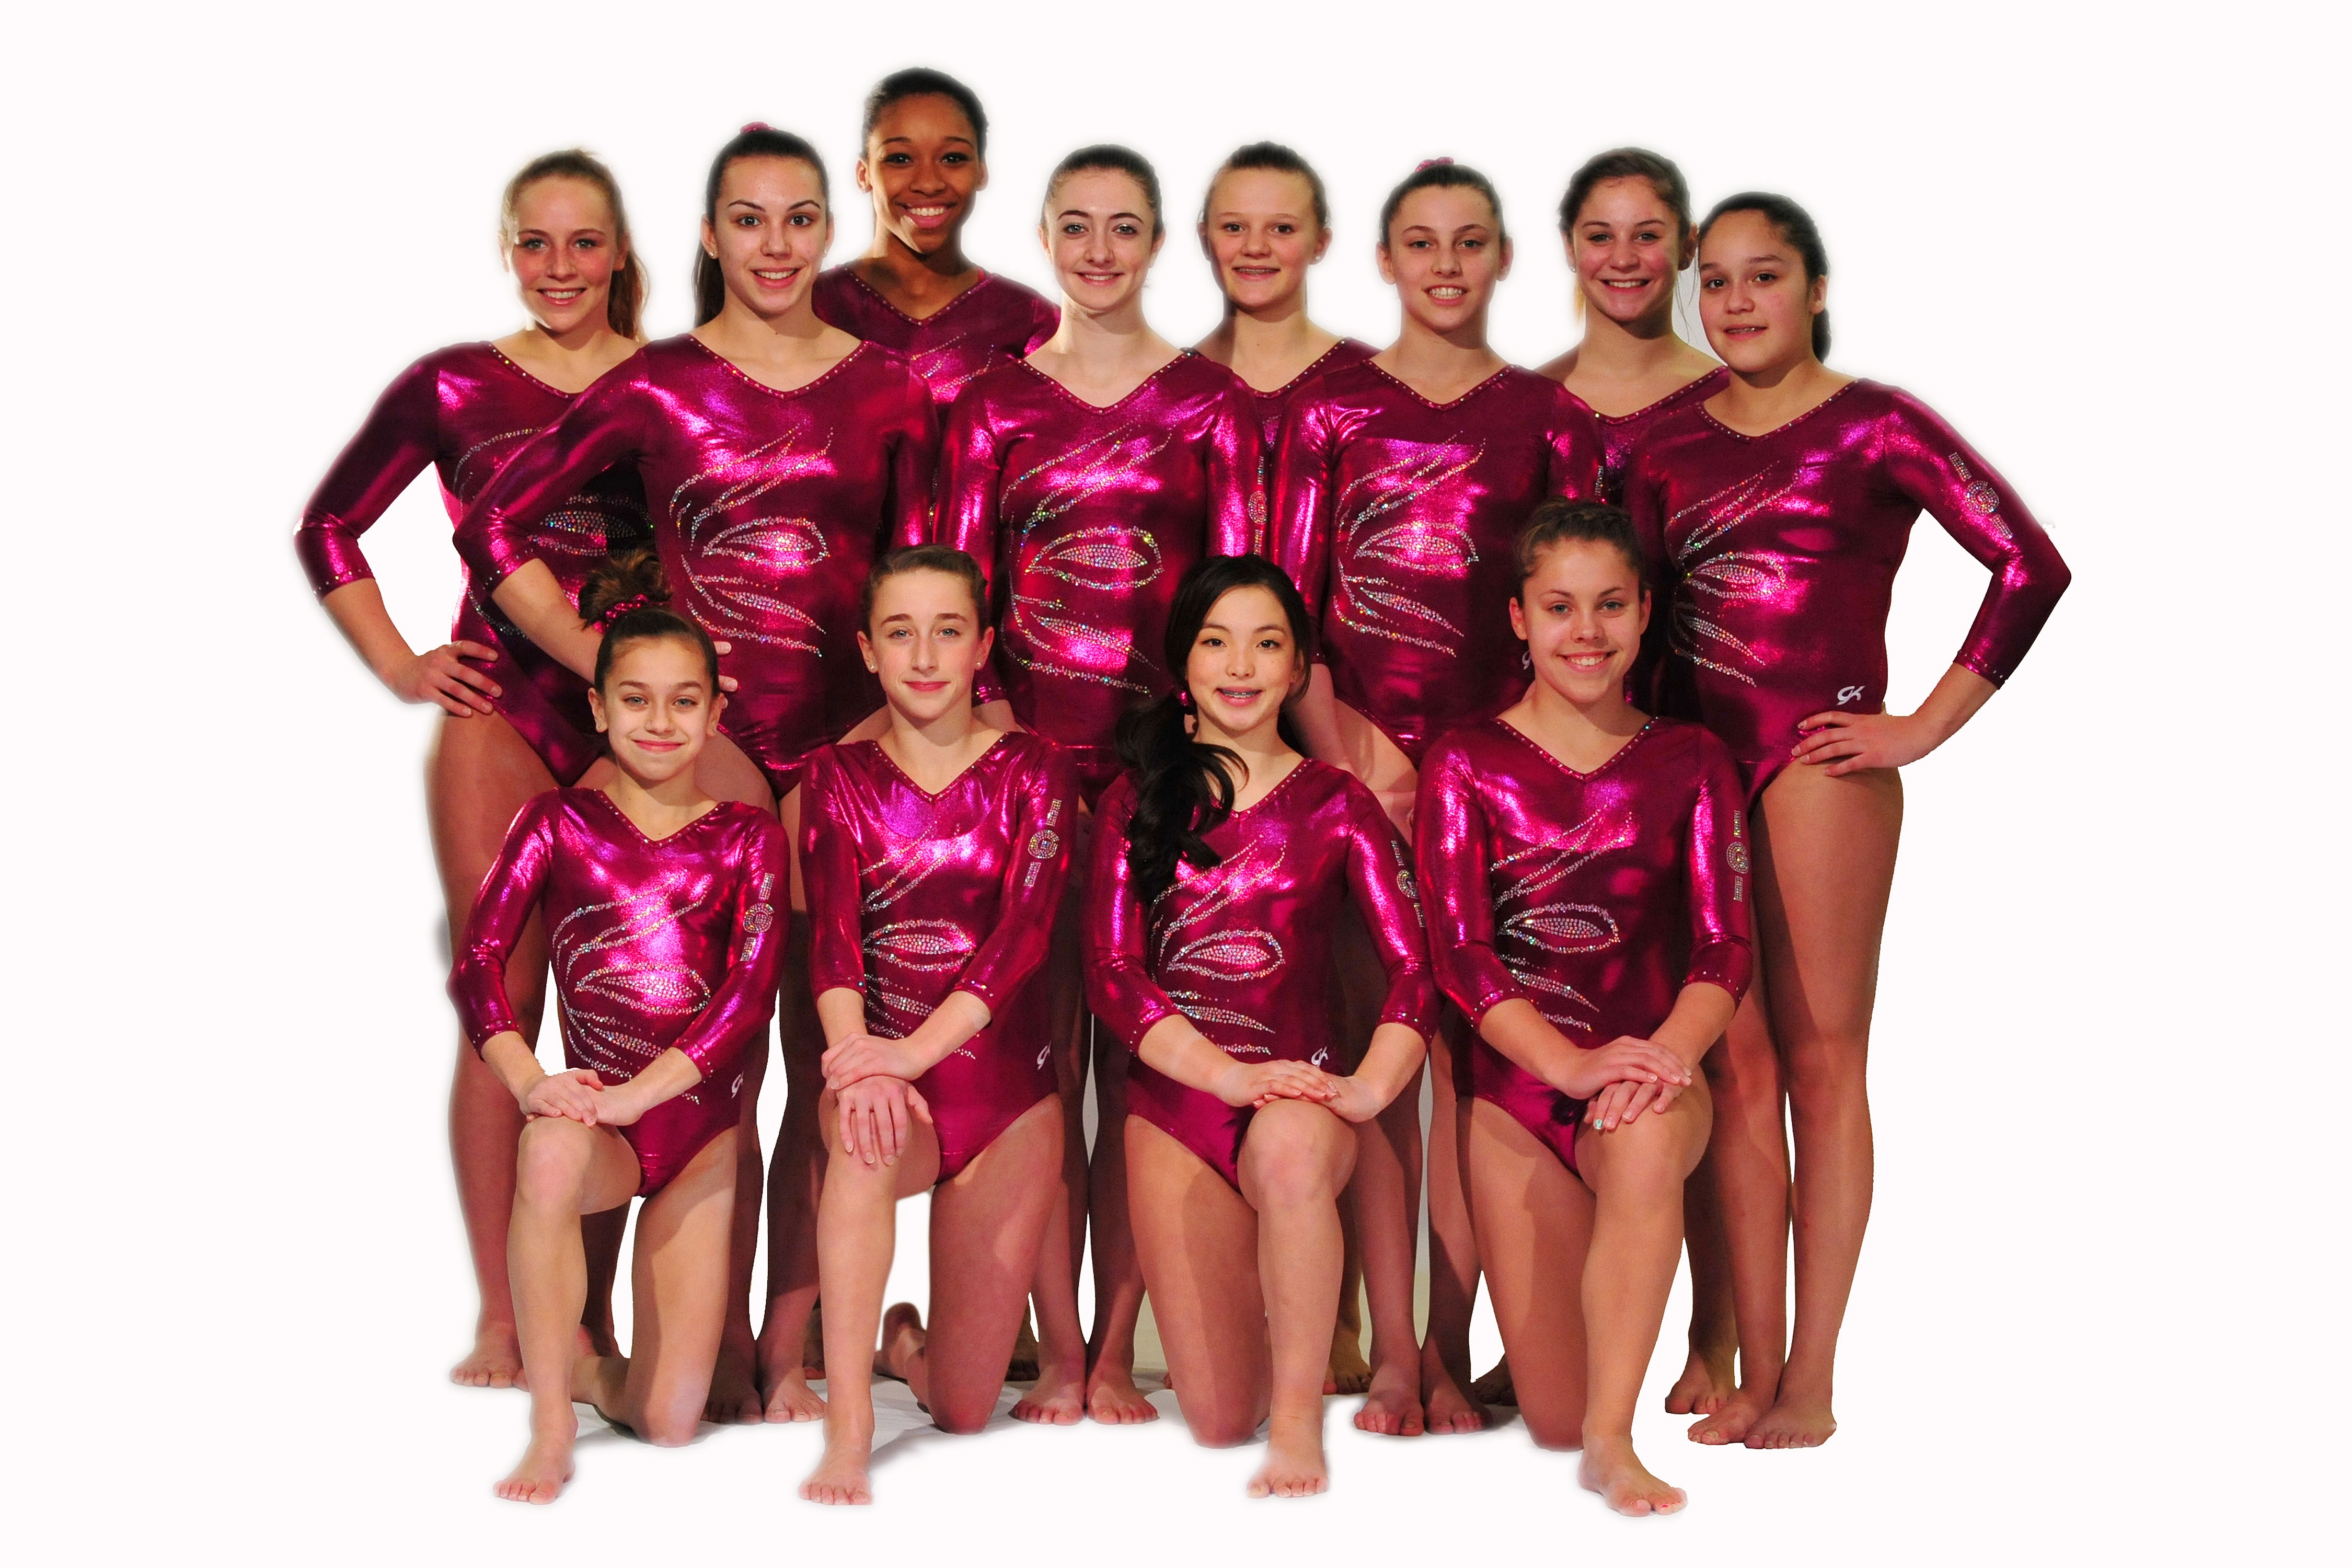 igi gymnastics meet 2012 calendar